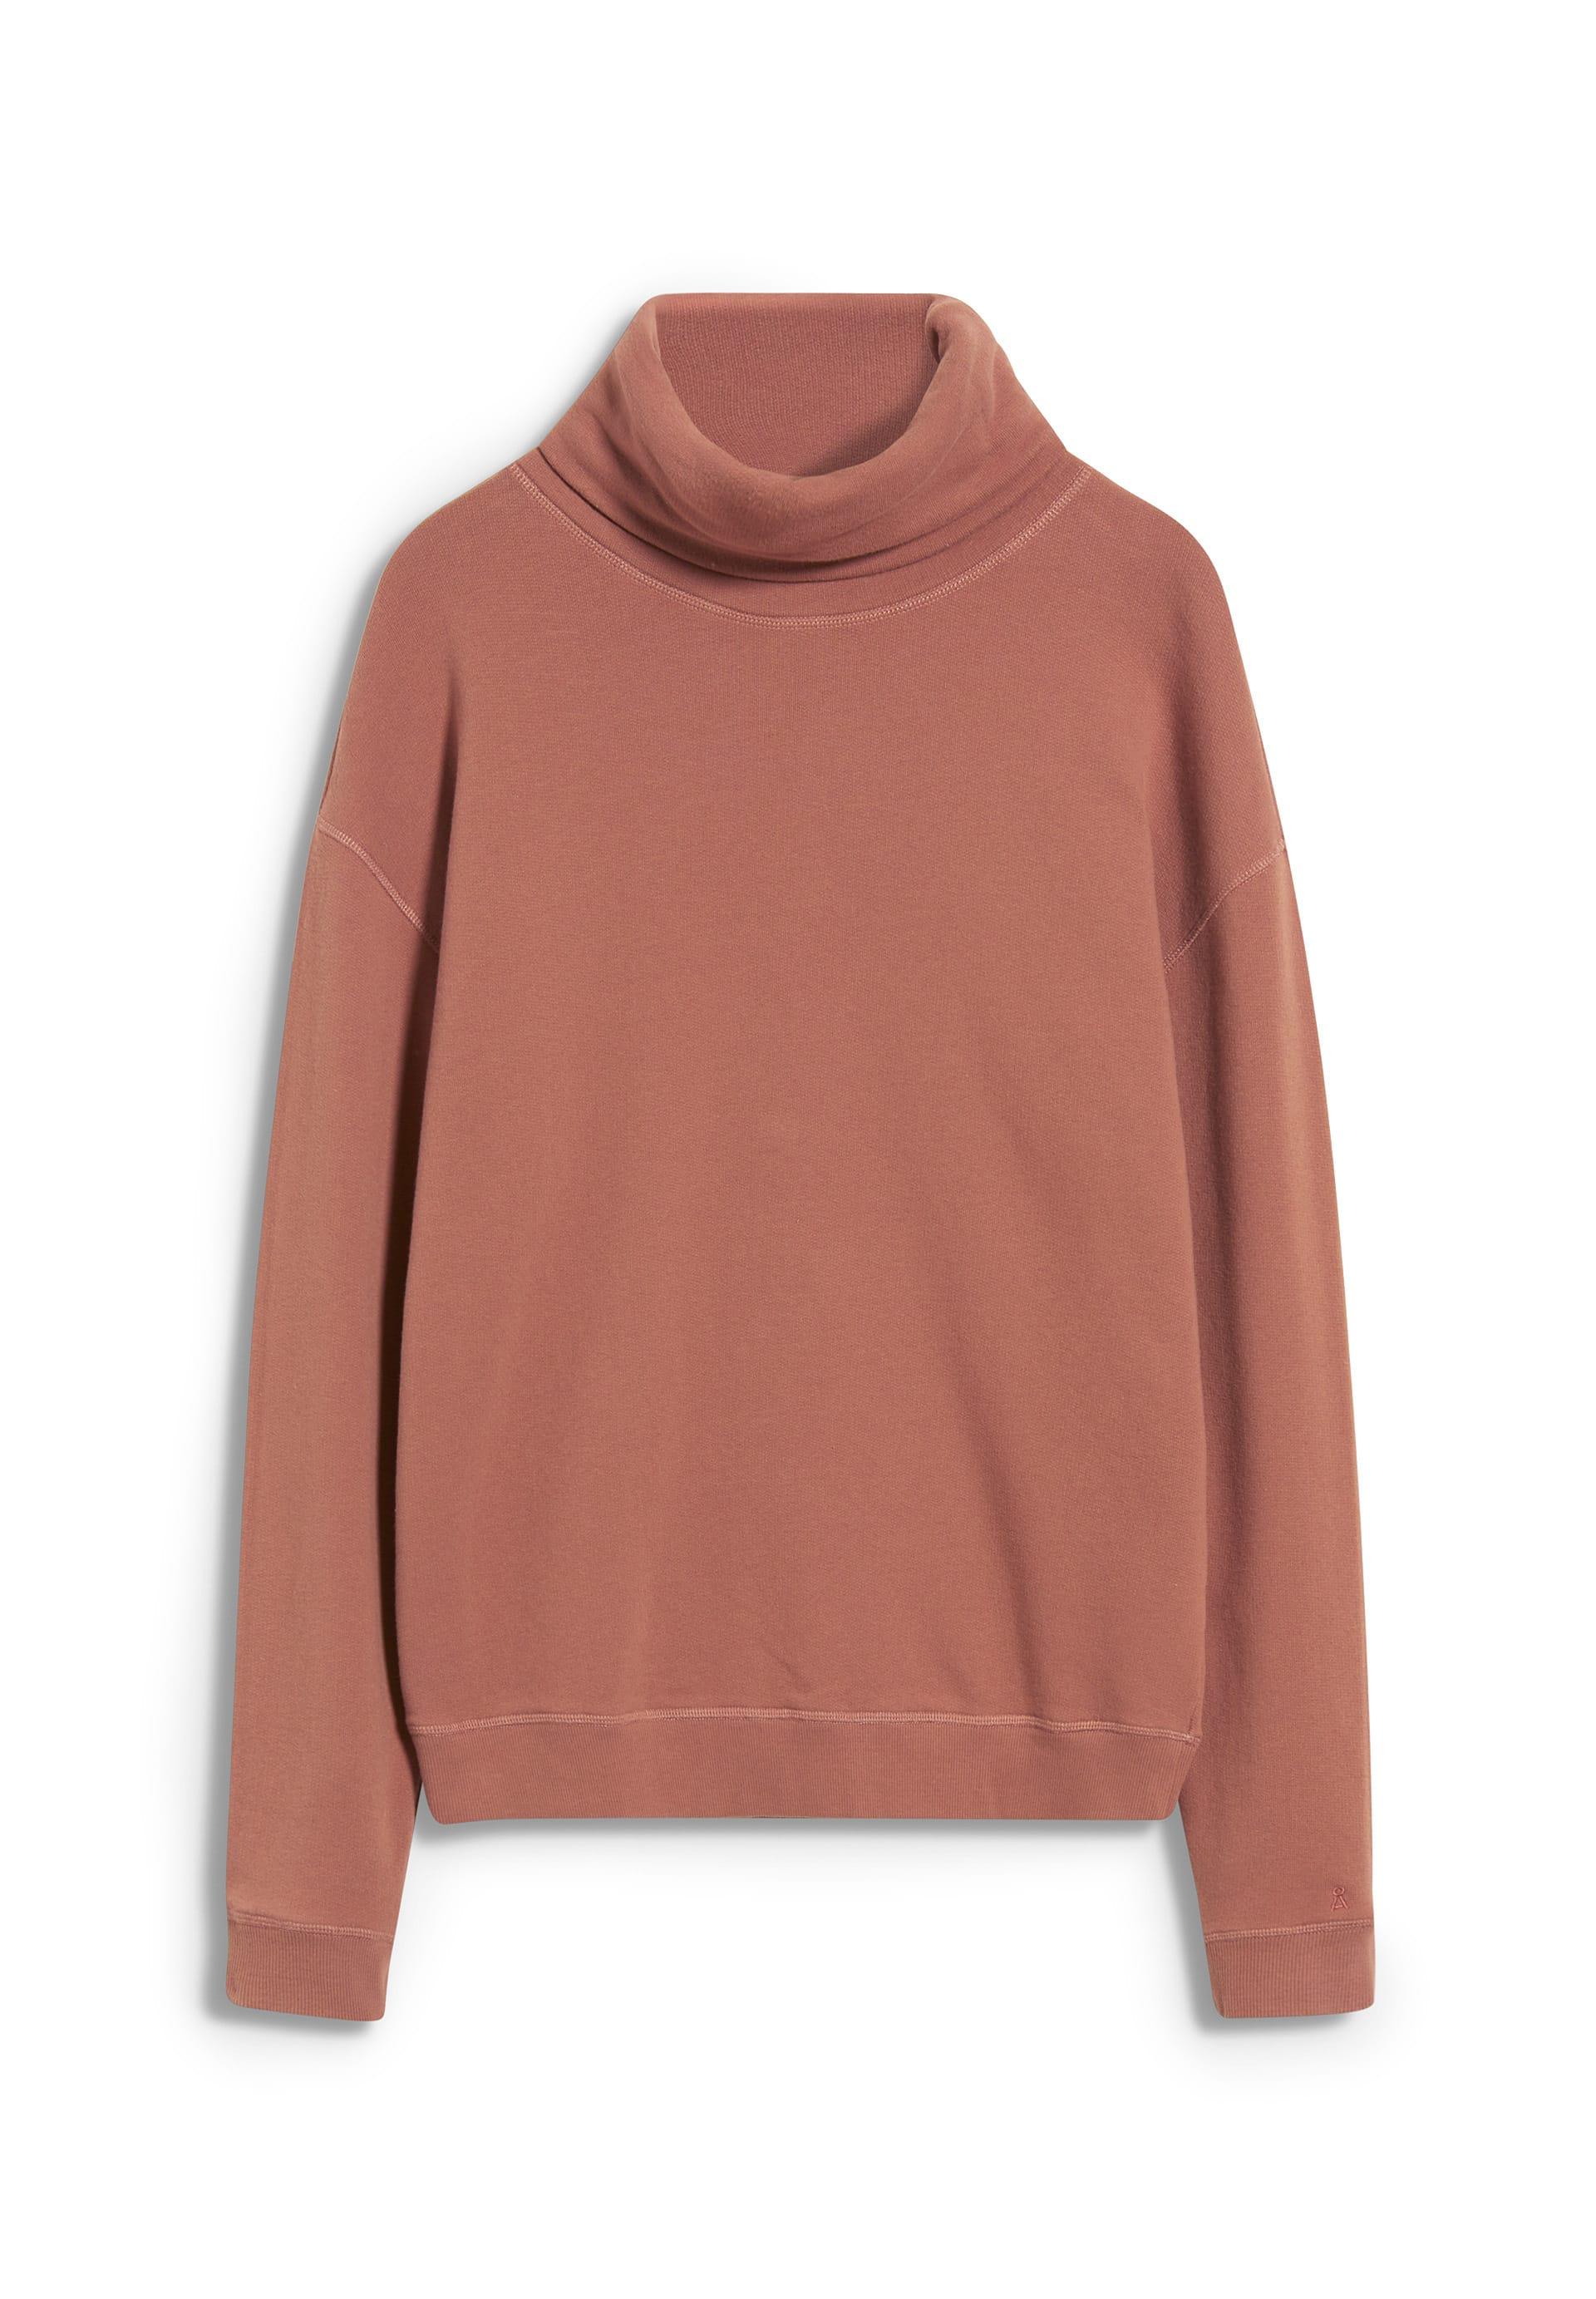 DARINAA Sweat-shirt en coton biologique mélangé